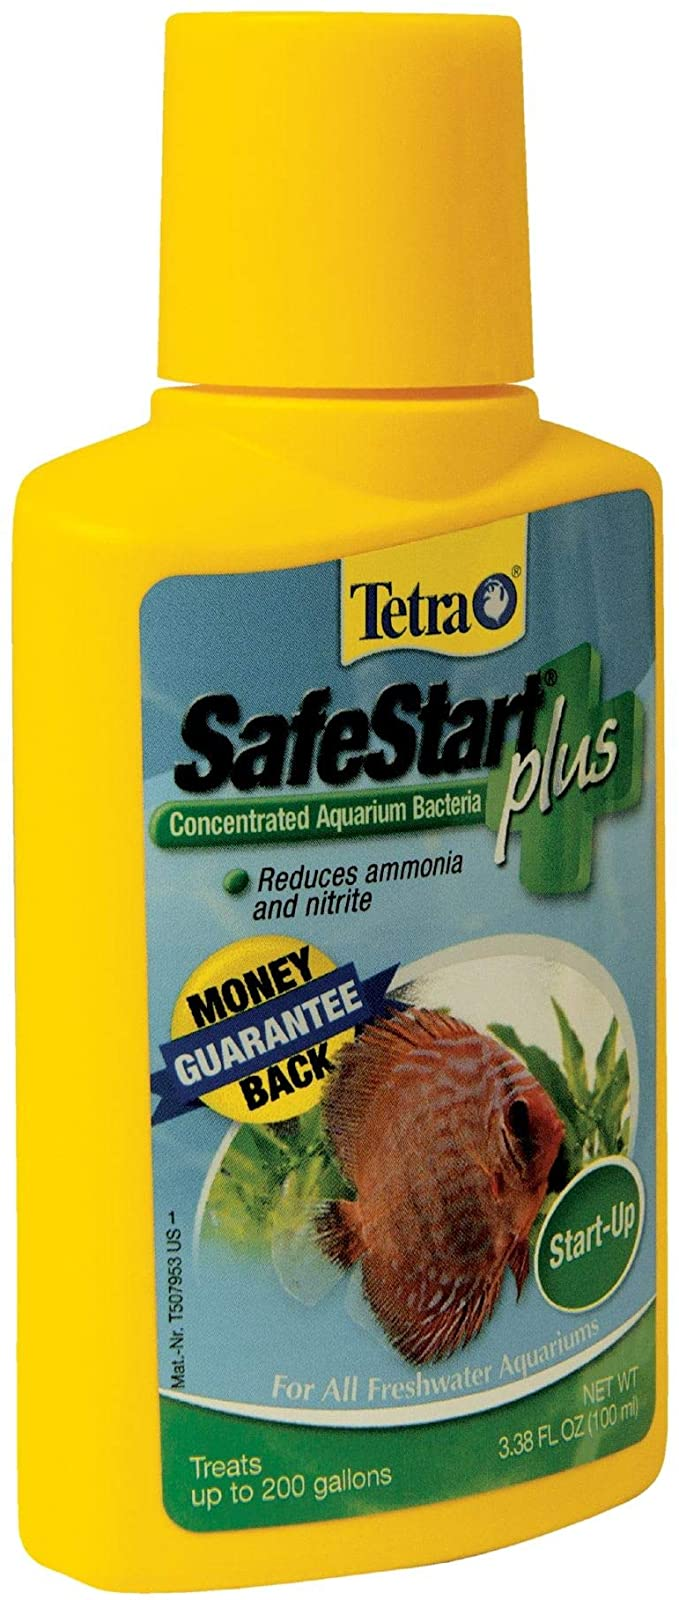 Tetra 77961 product image 7